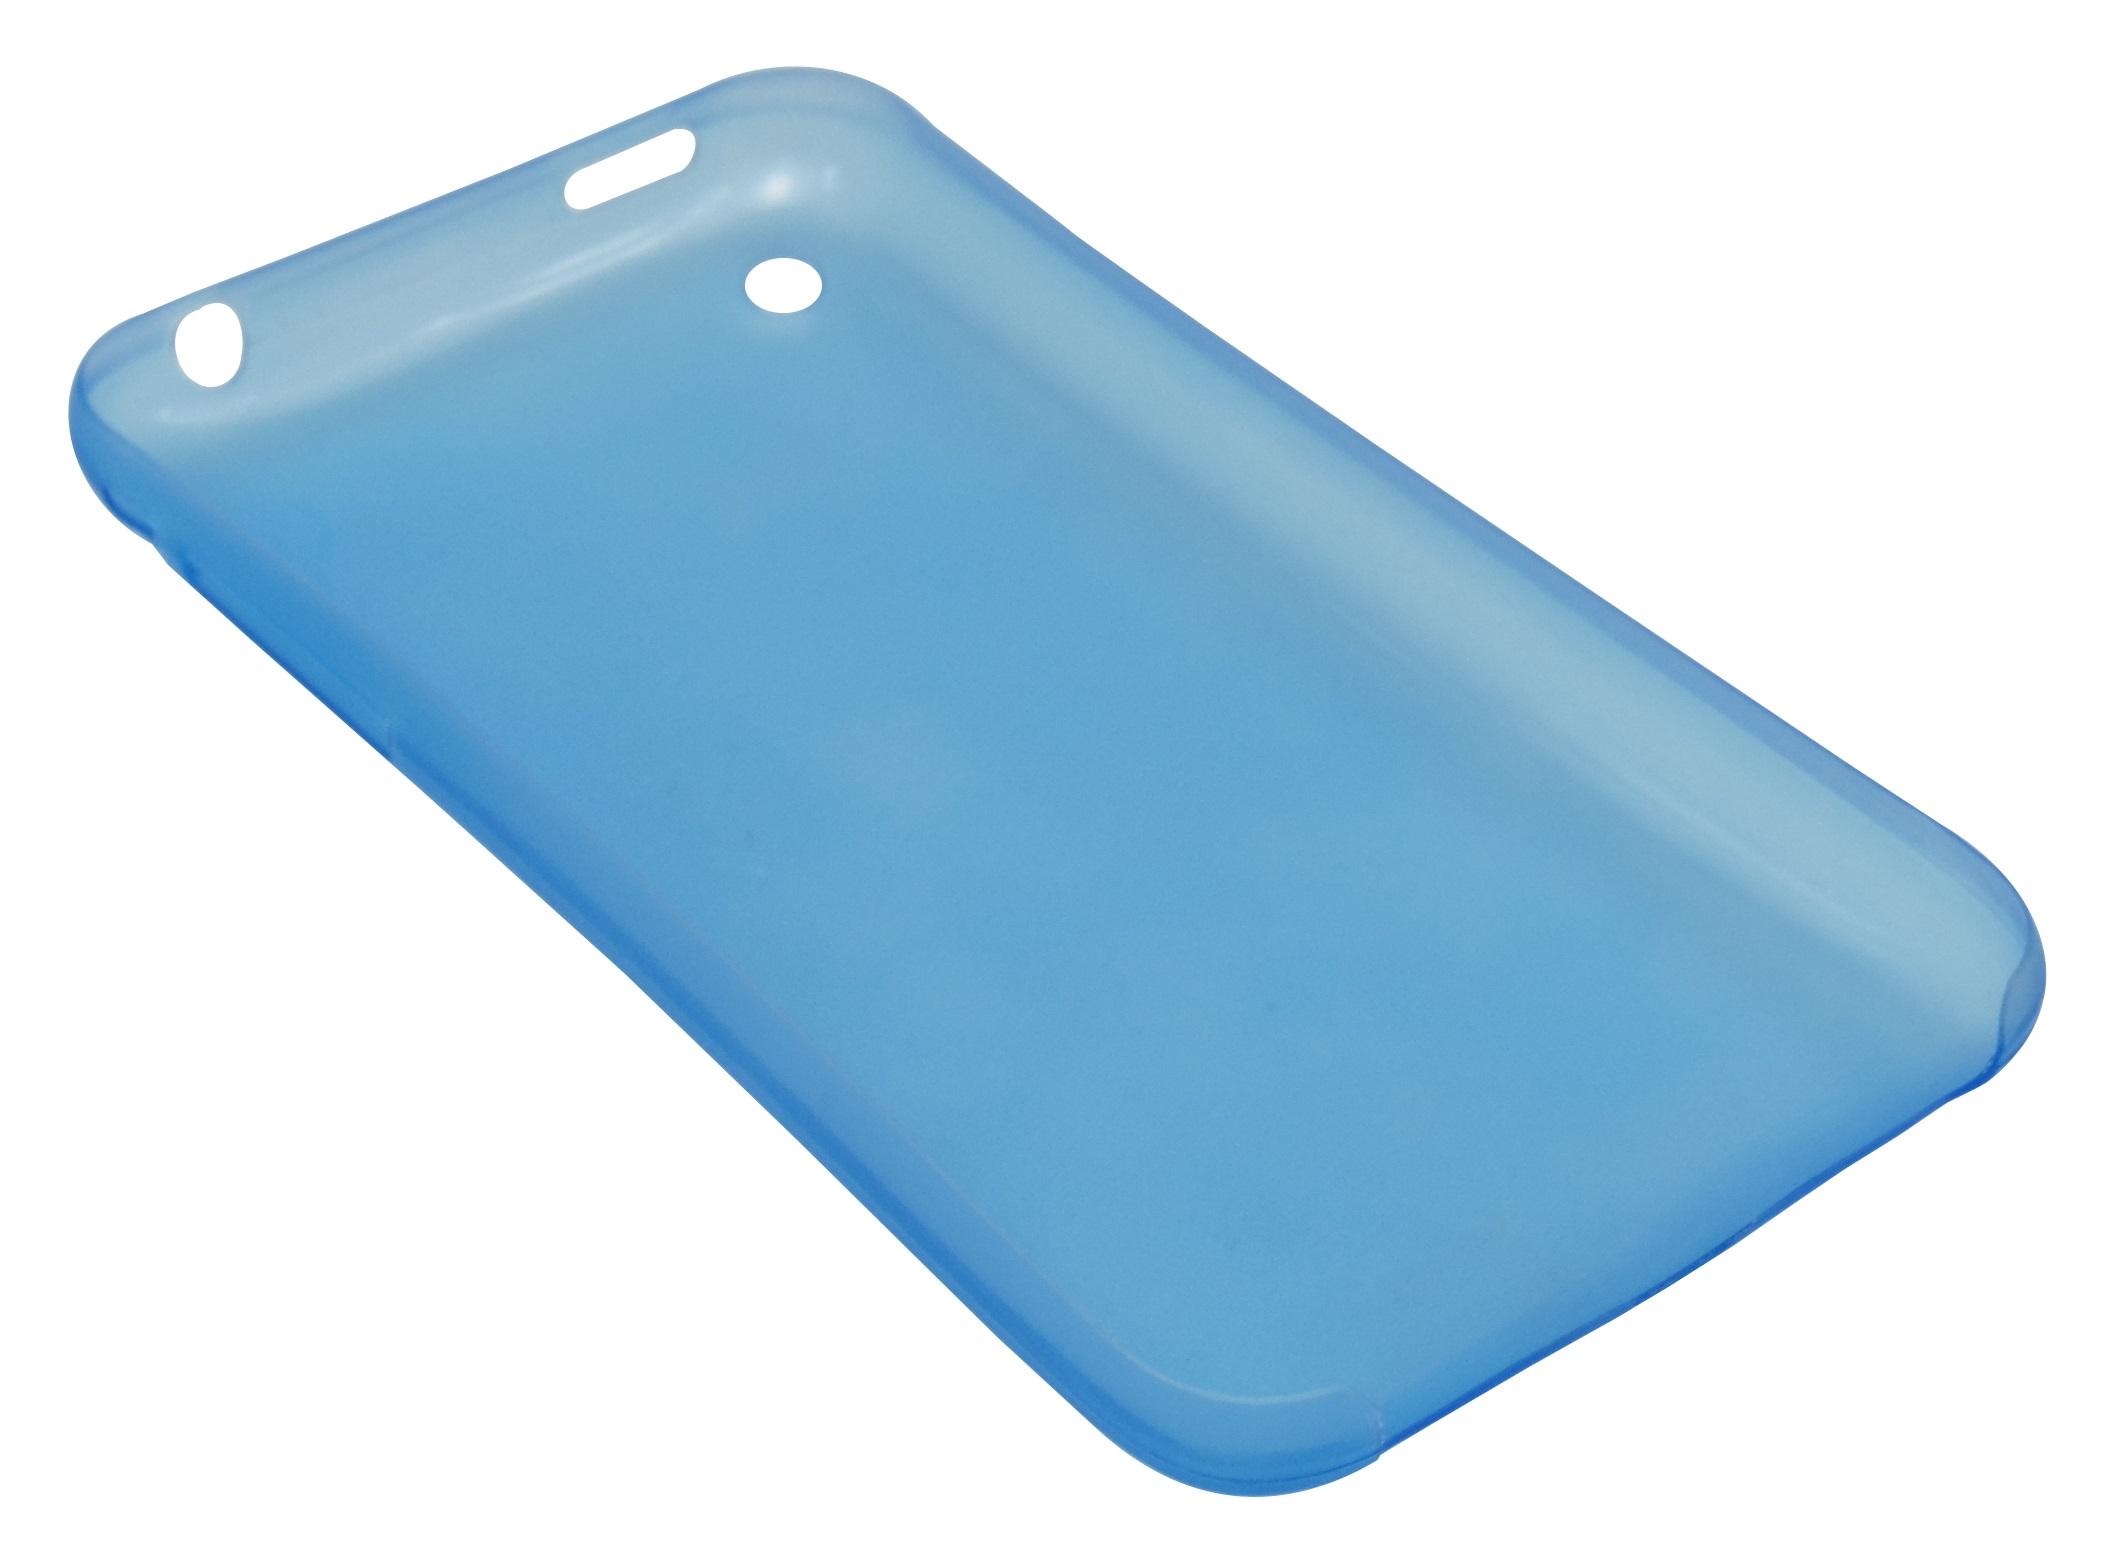 Husa ultraslim albastra semitransparenta pentru Apple iPhone 3G/3GS